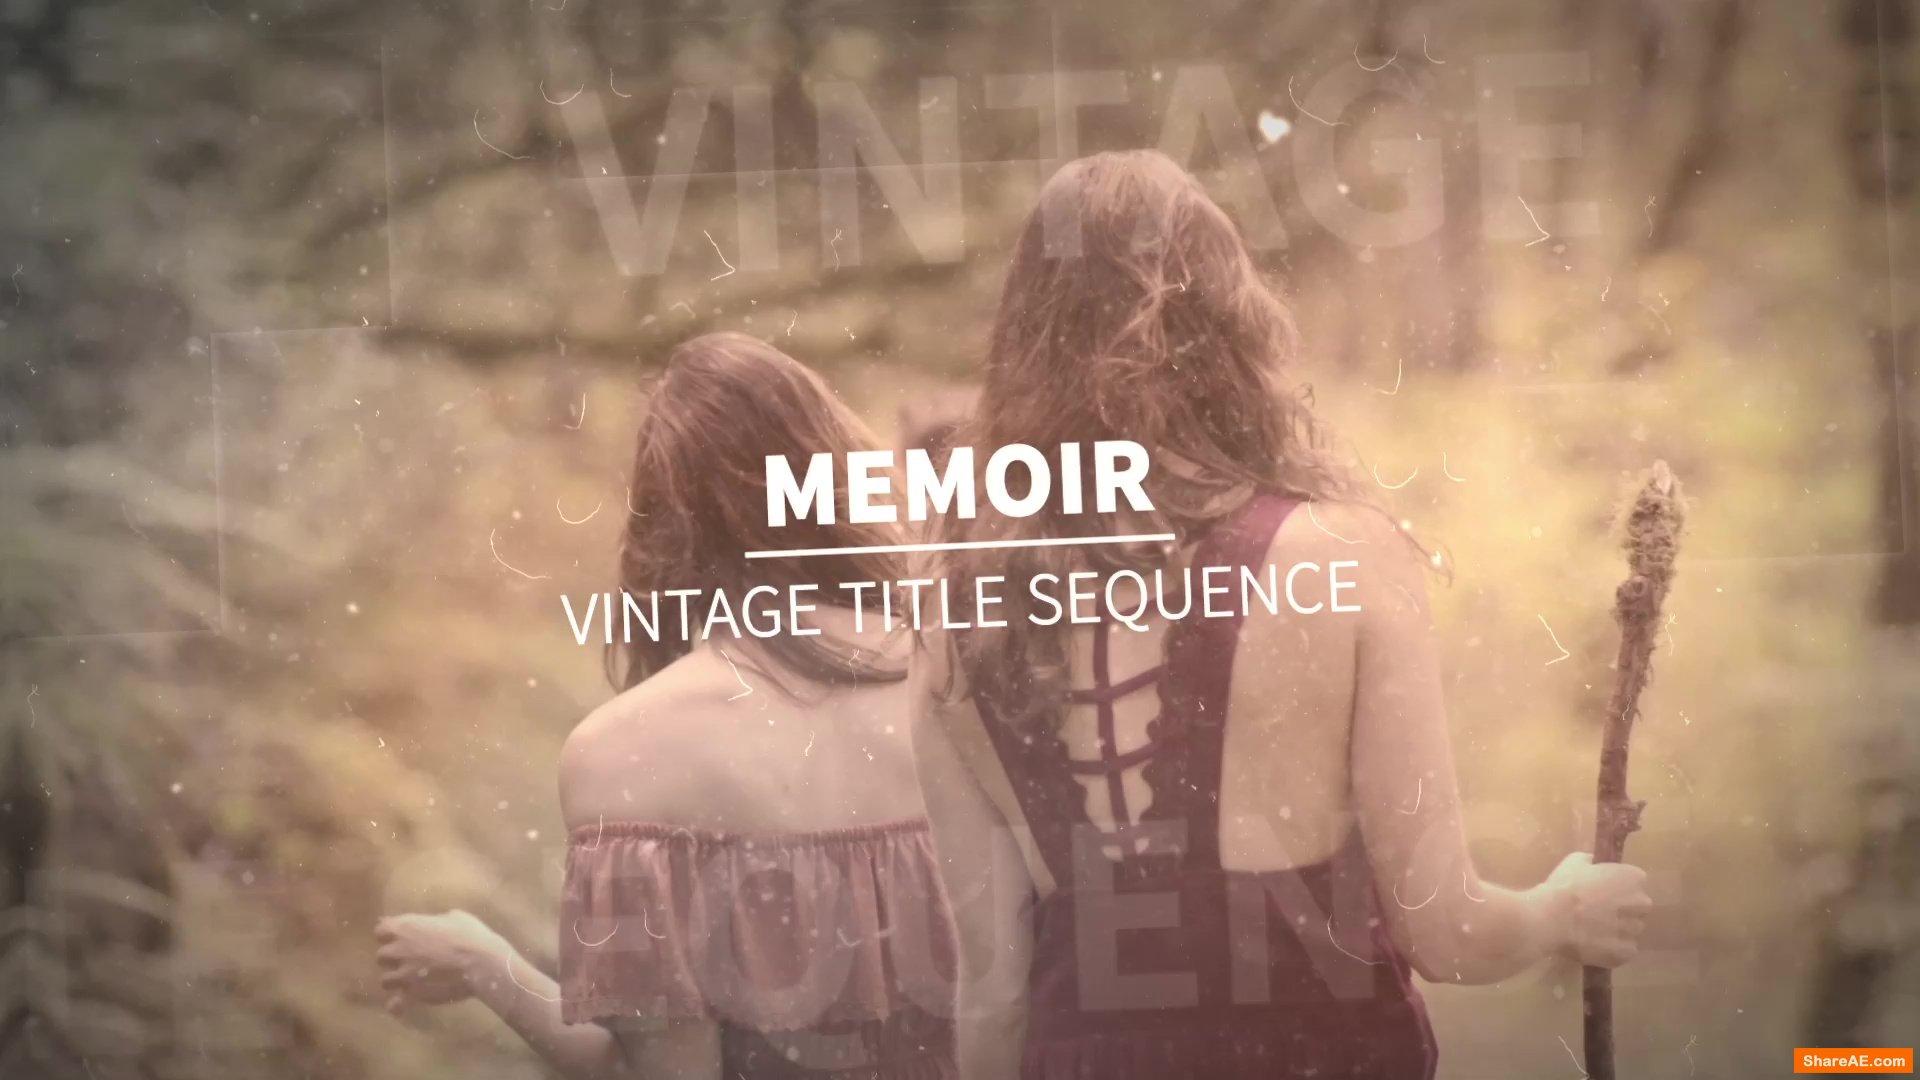 Memoir - Vintage Title Sequence (RocketStock)